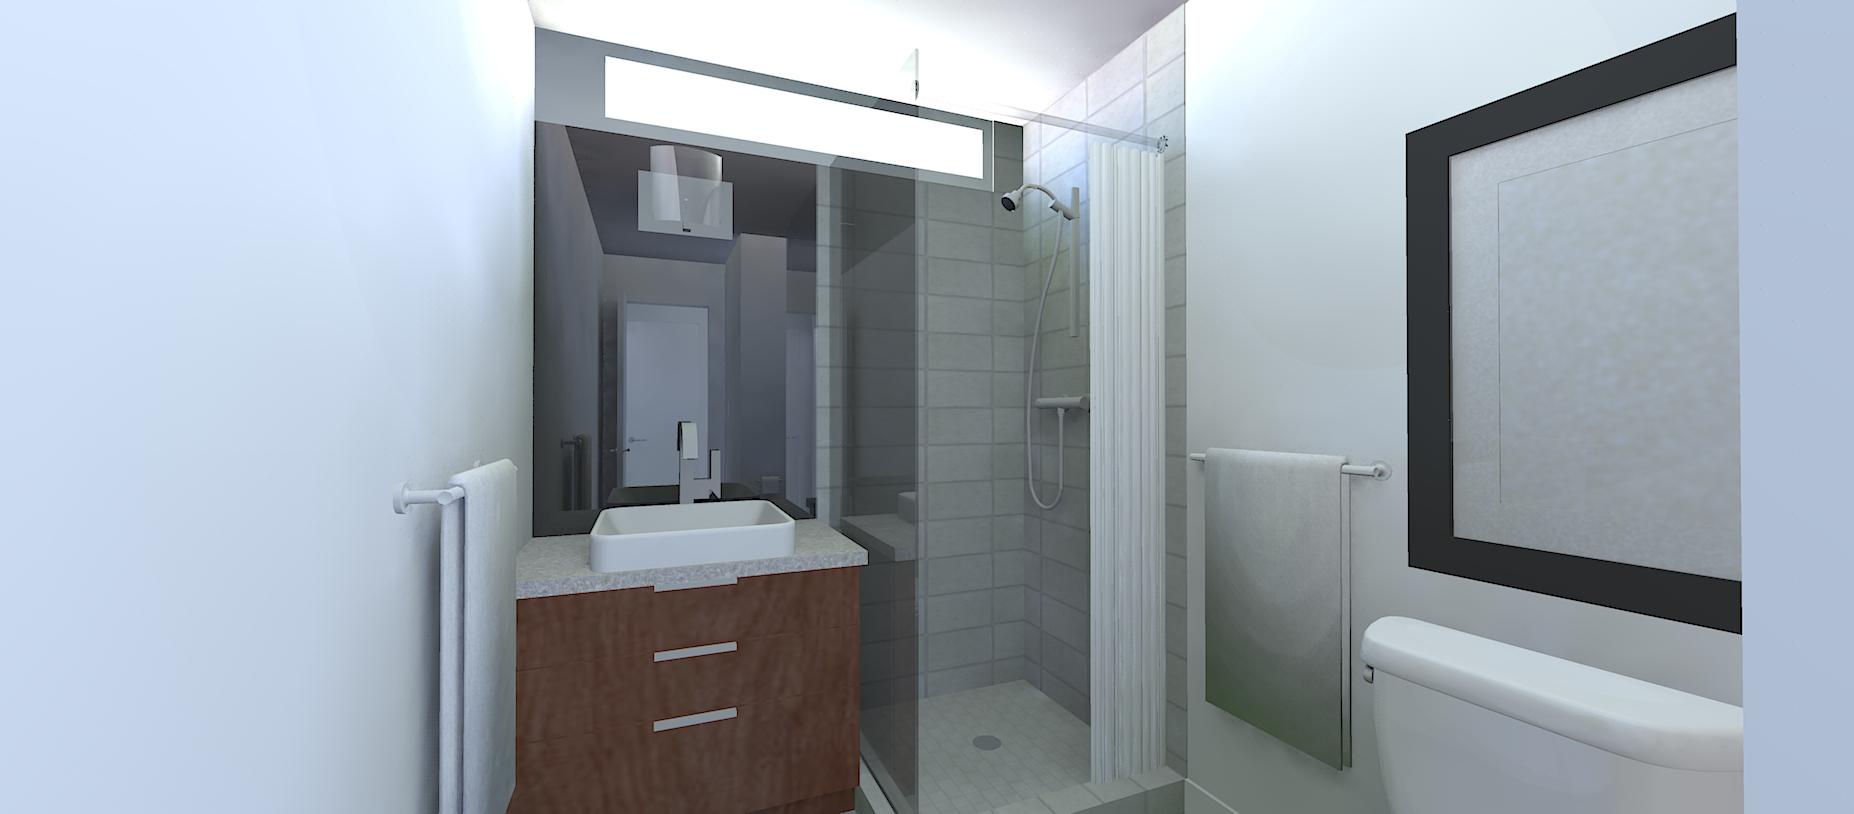 21 - Loft Bathroom.jpg